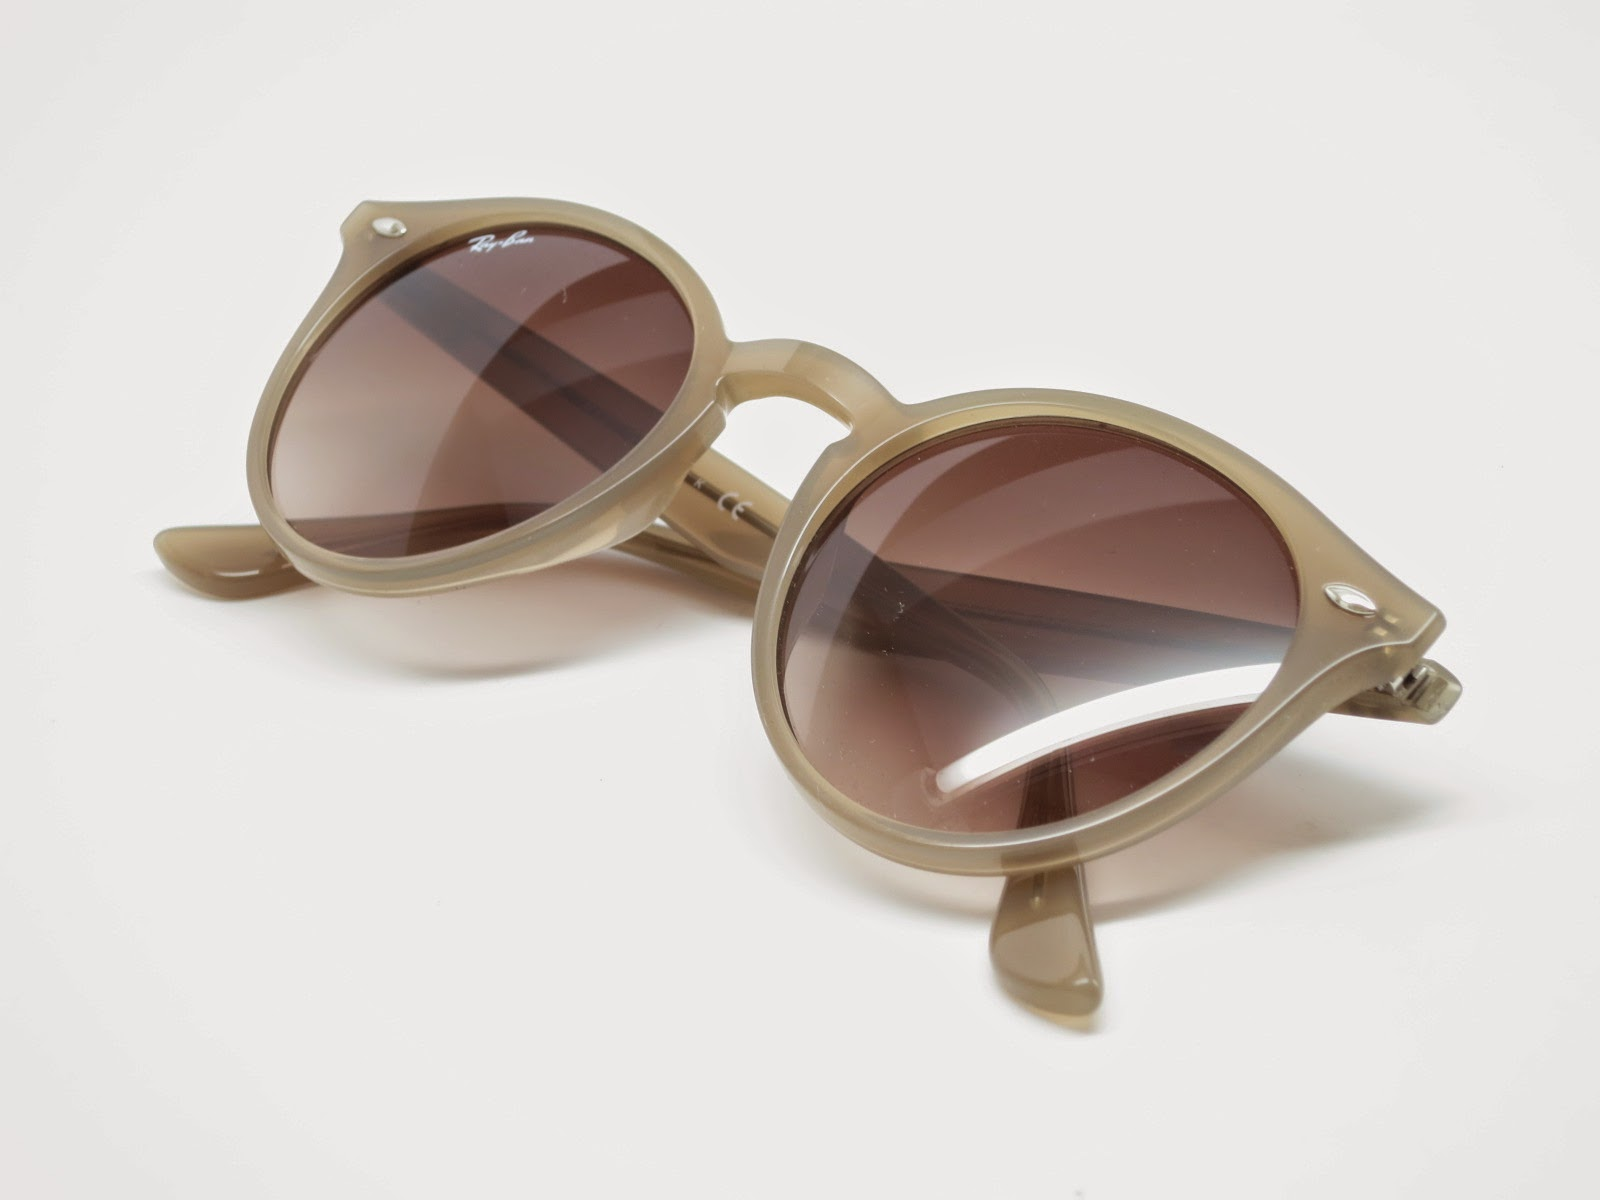 Ray Ban Rb 2180 6166 13 Turtle Dove Sunglasses I Love